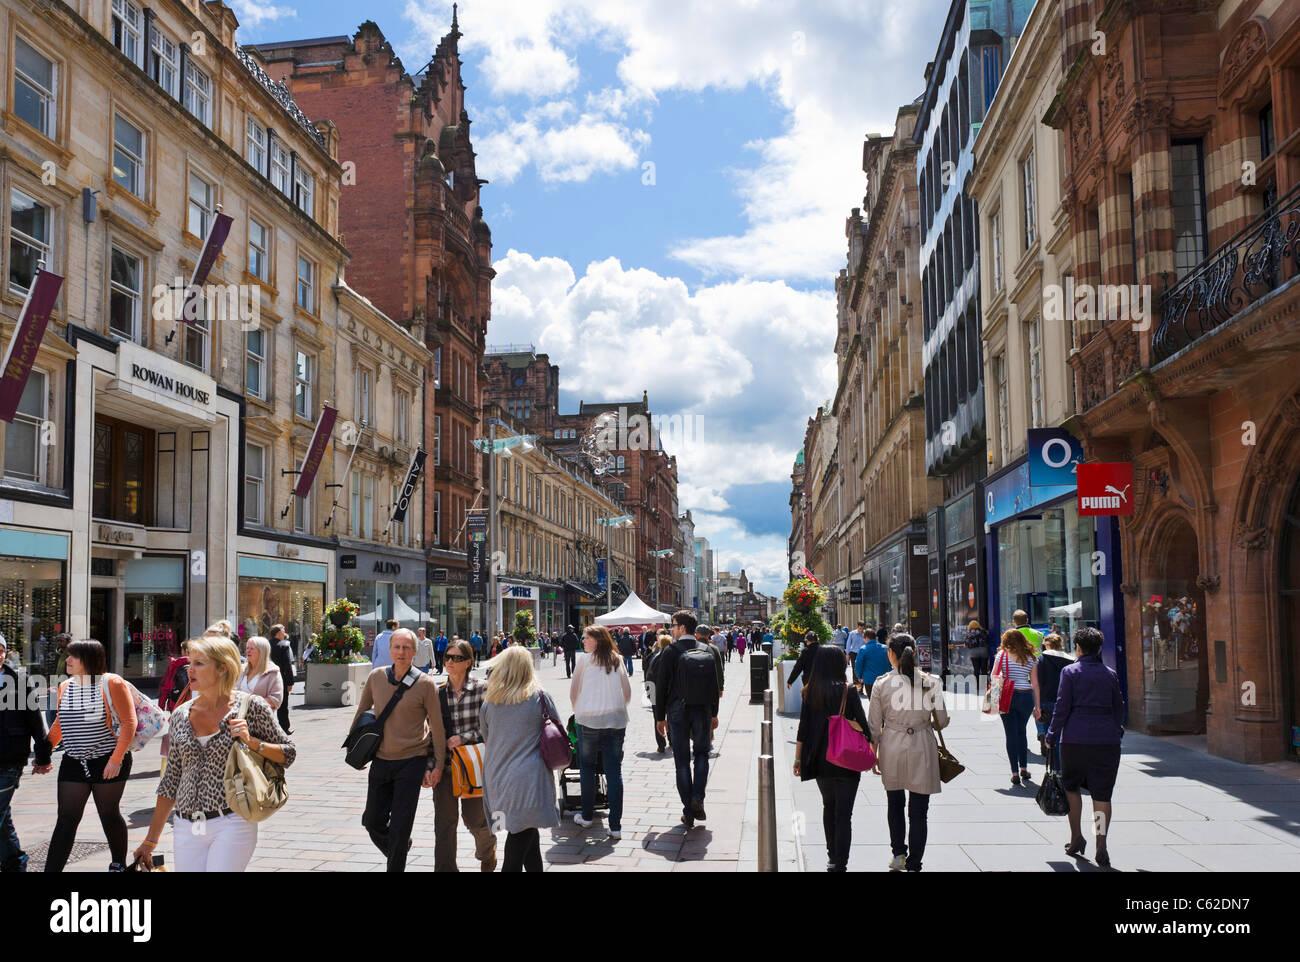 Shops on Buchanan Street in the city centre, Glasgow, Scotland, UK - Stock Image